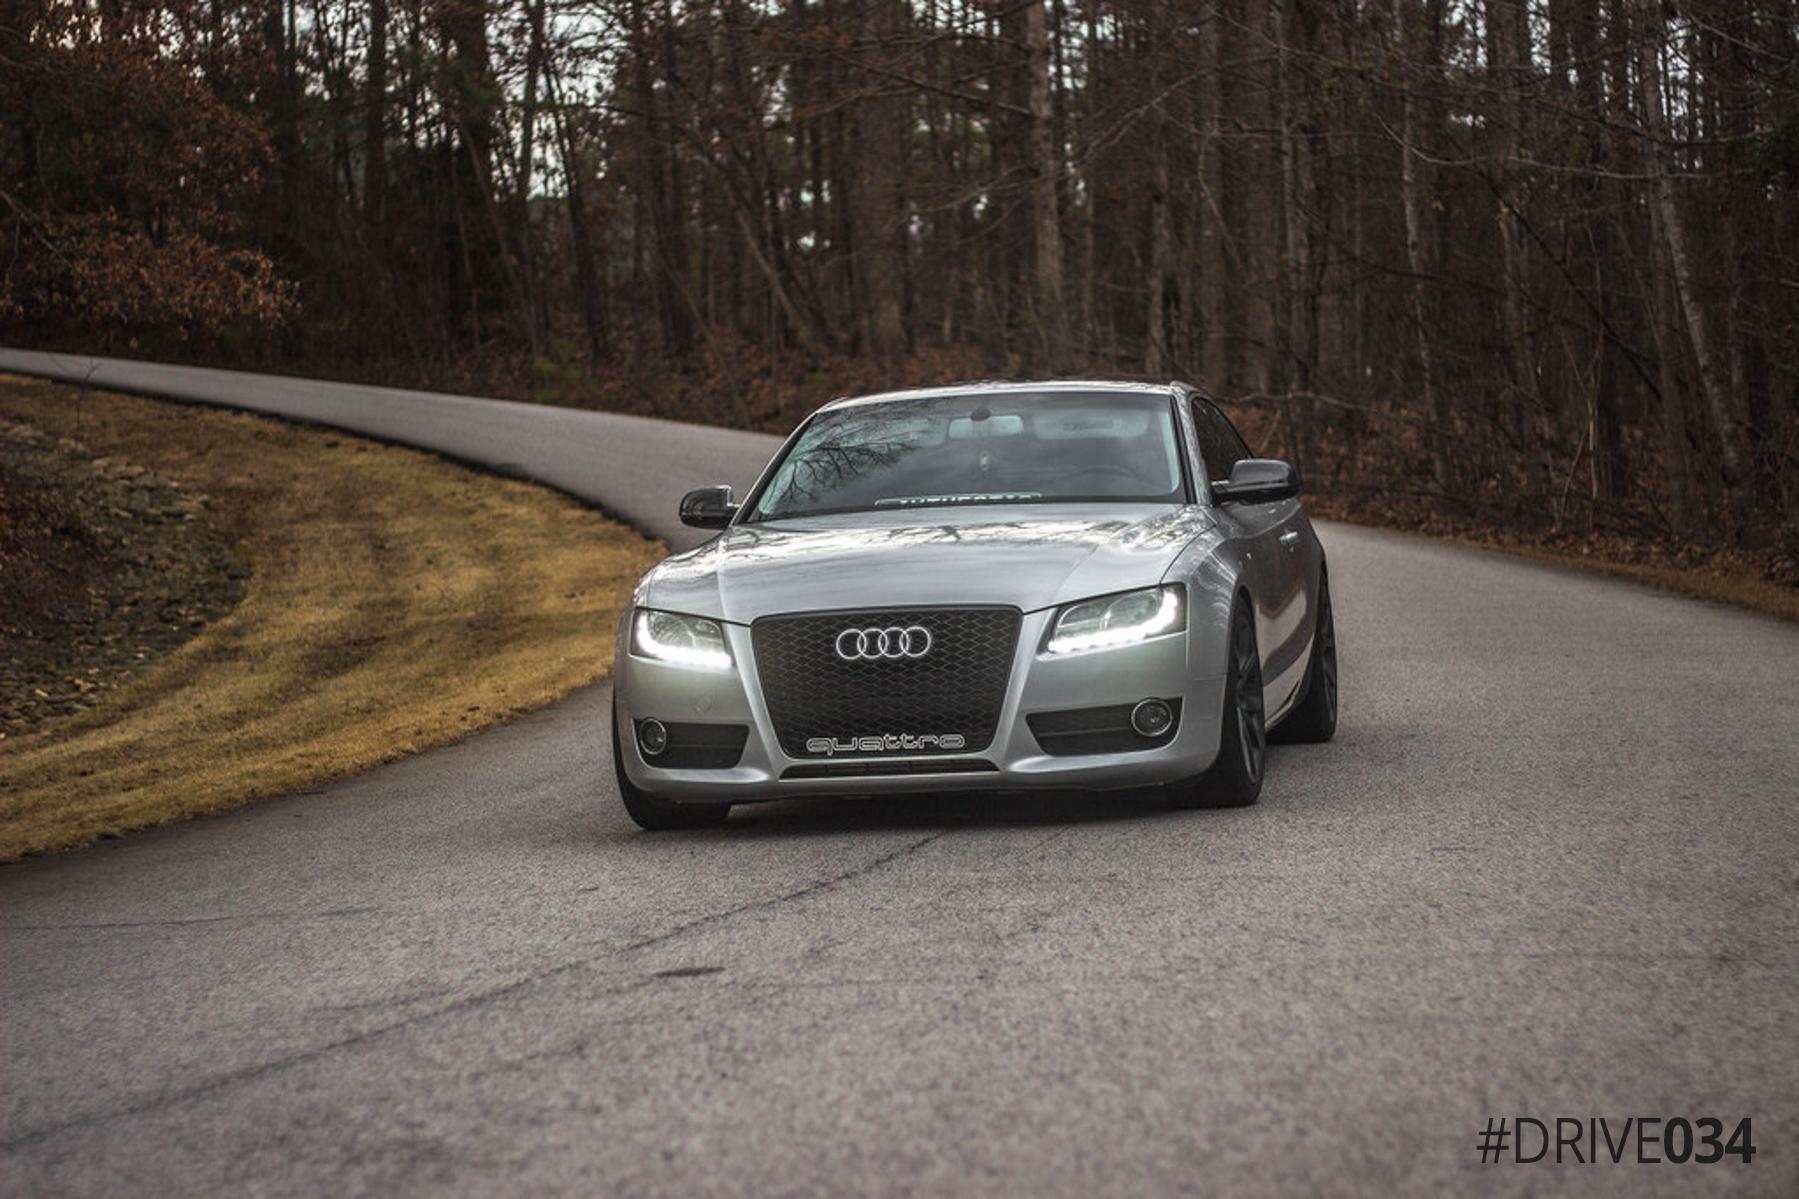 Tuned B8 Audi A5 2.0 TFSI 6-Speed Quattro